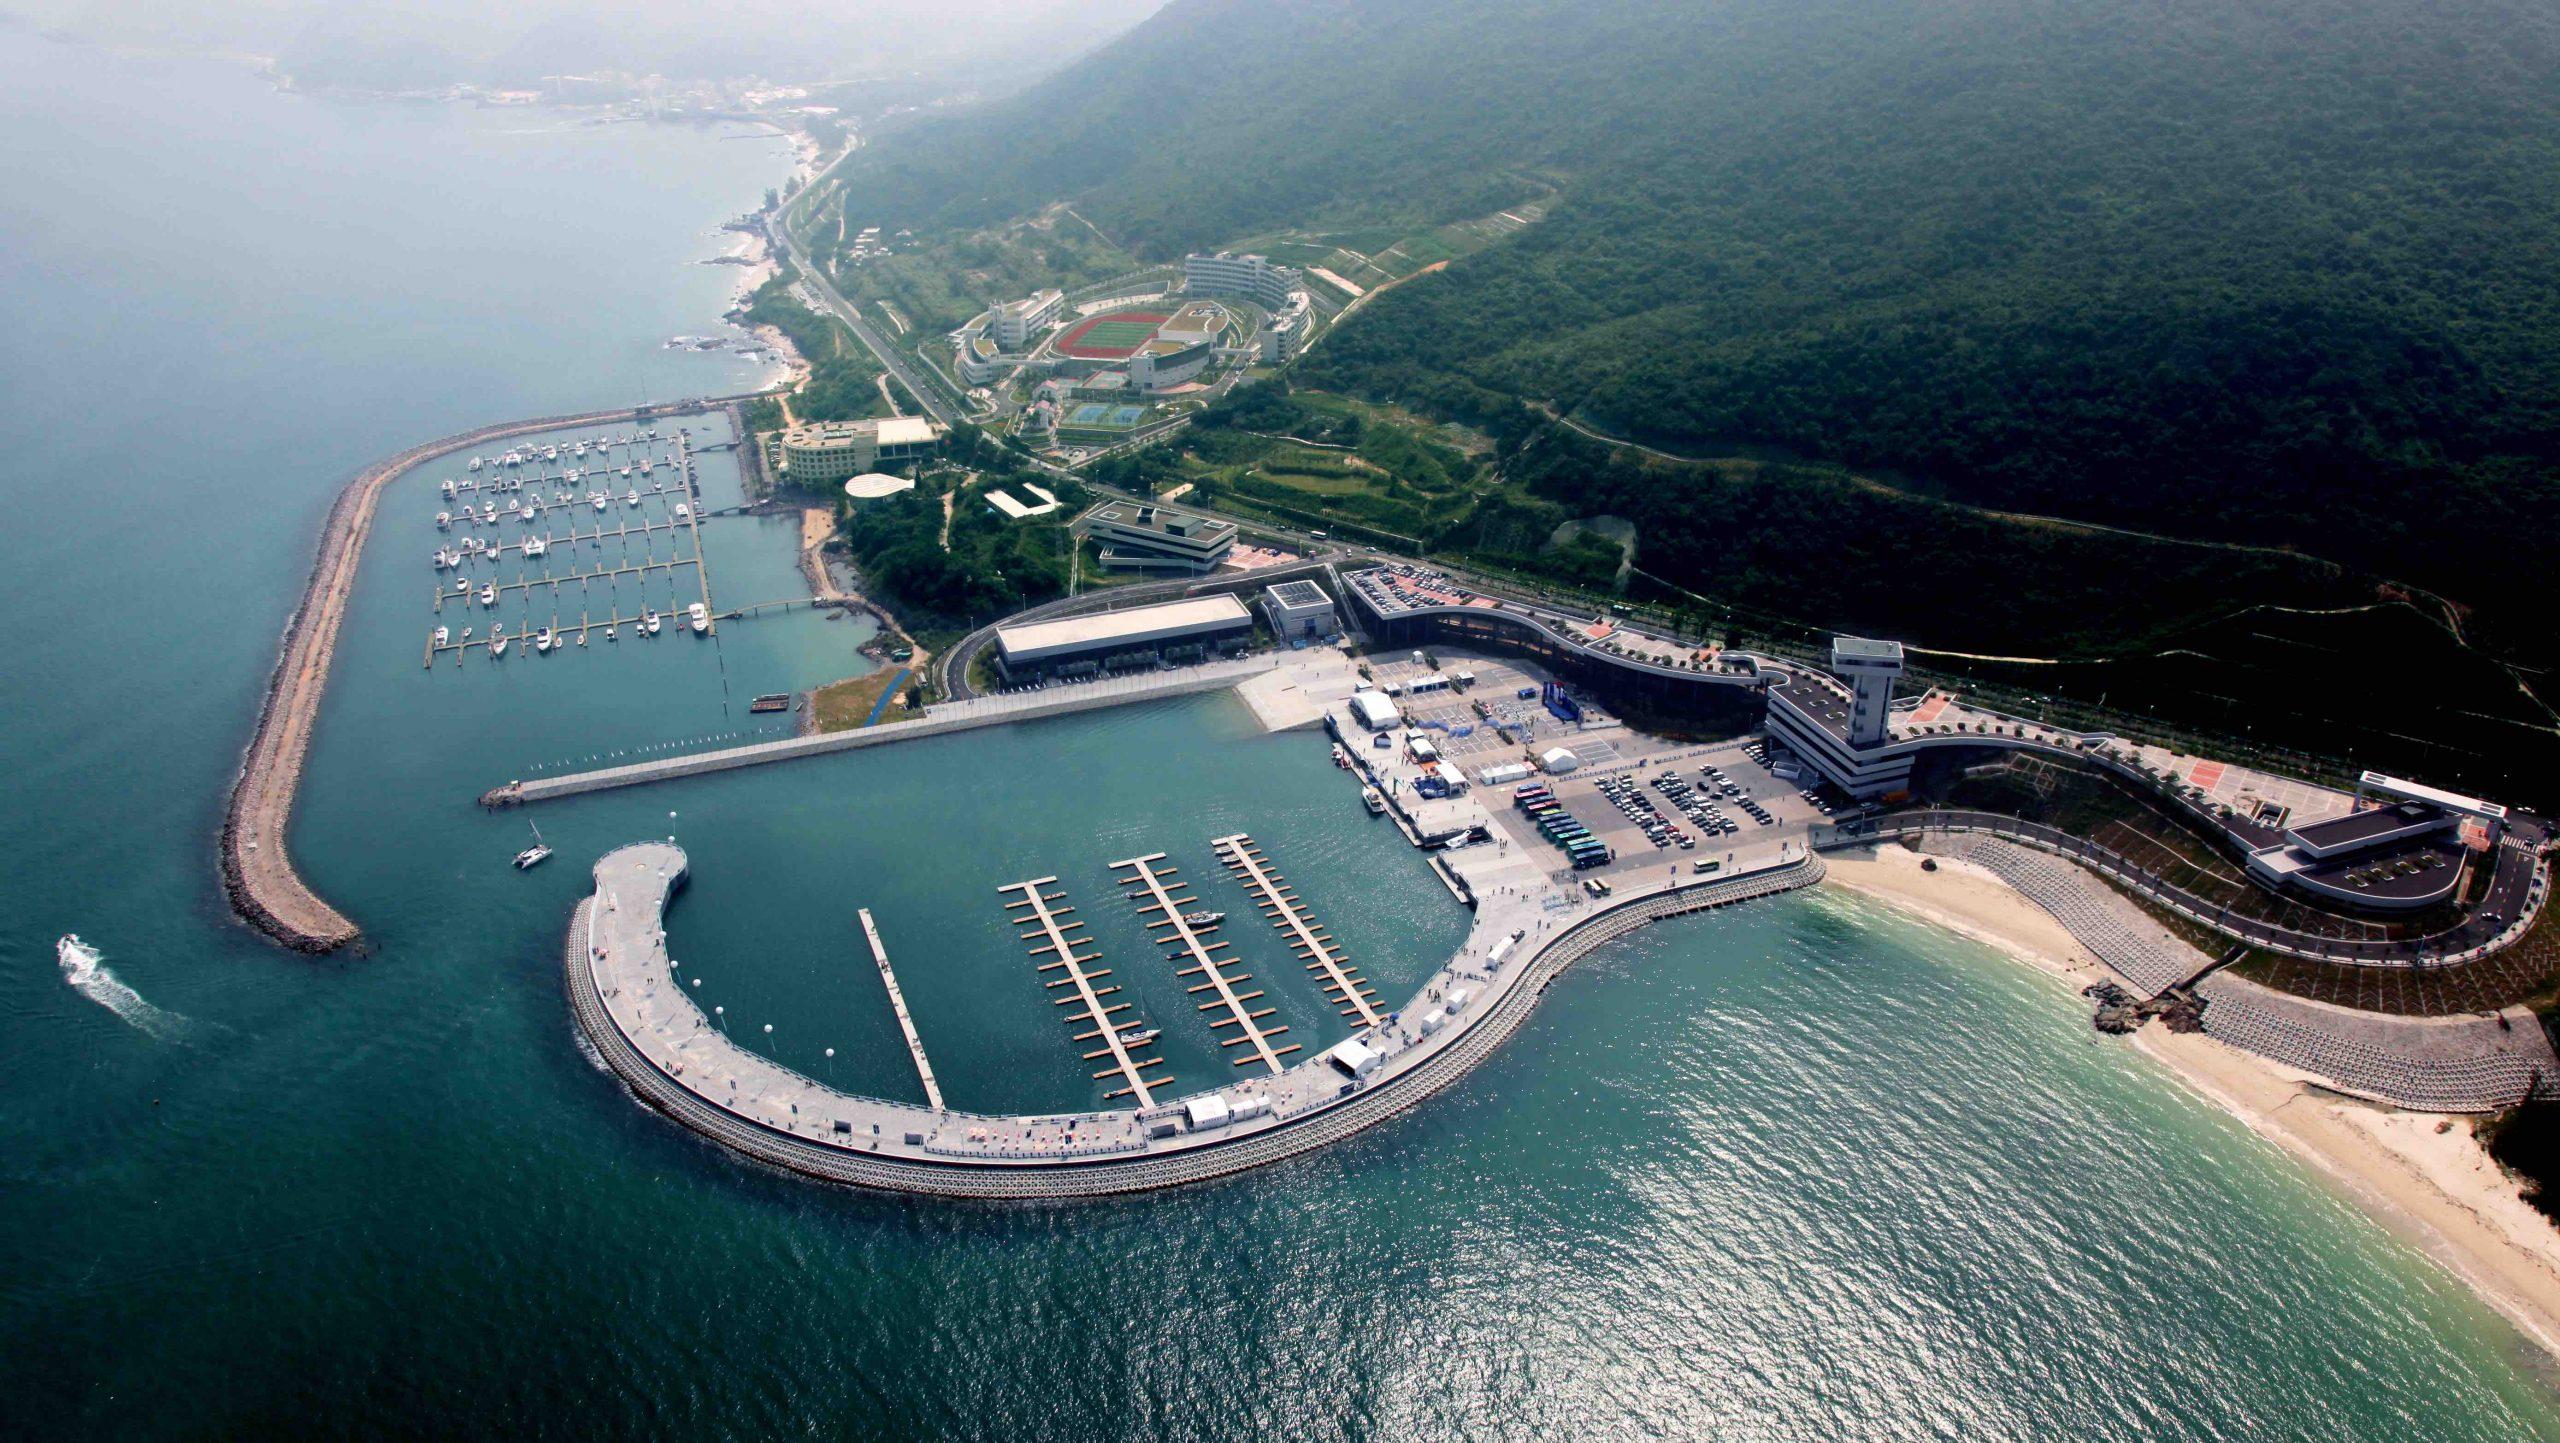 Shenzhen will host the WMRT final in 2017.